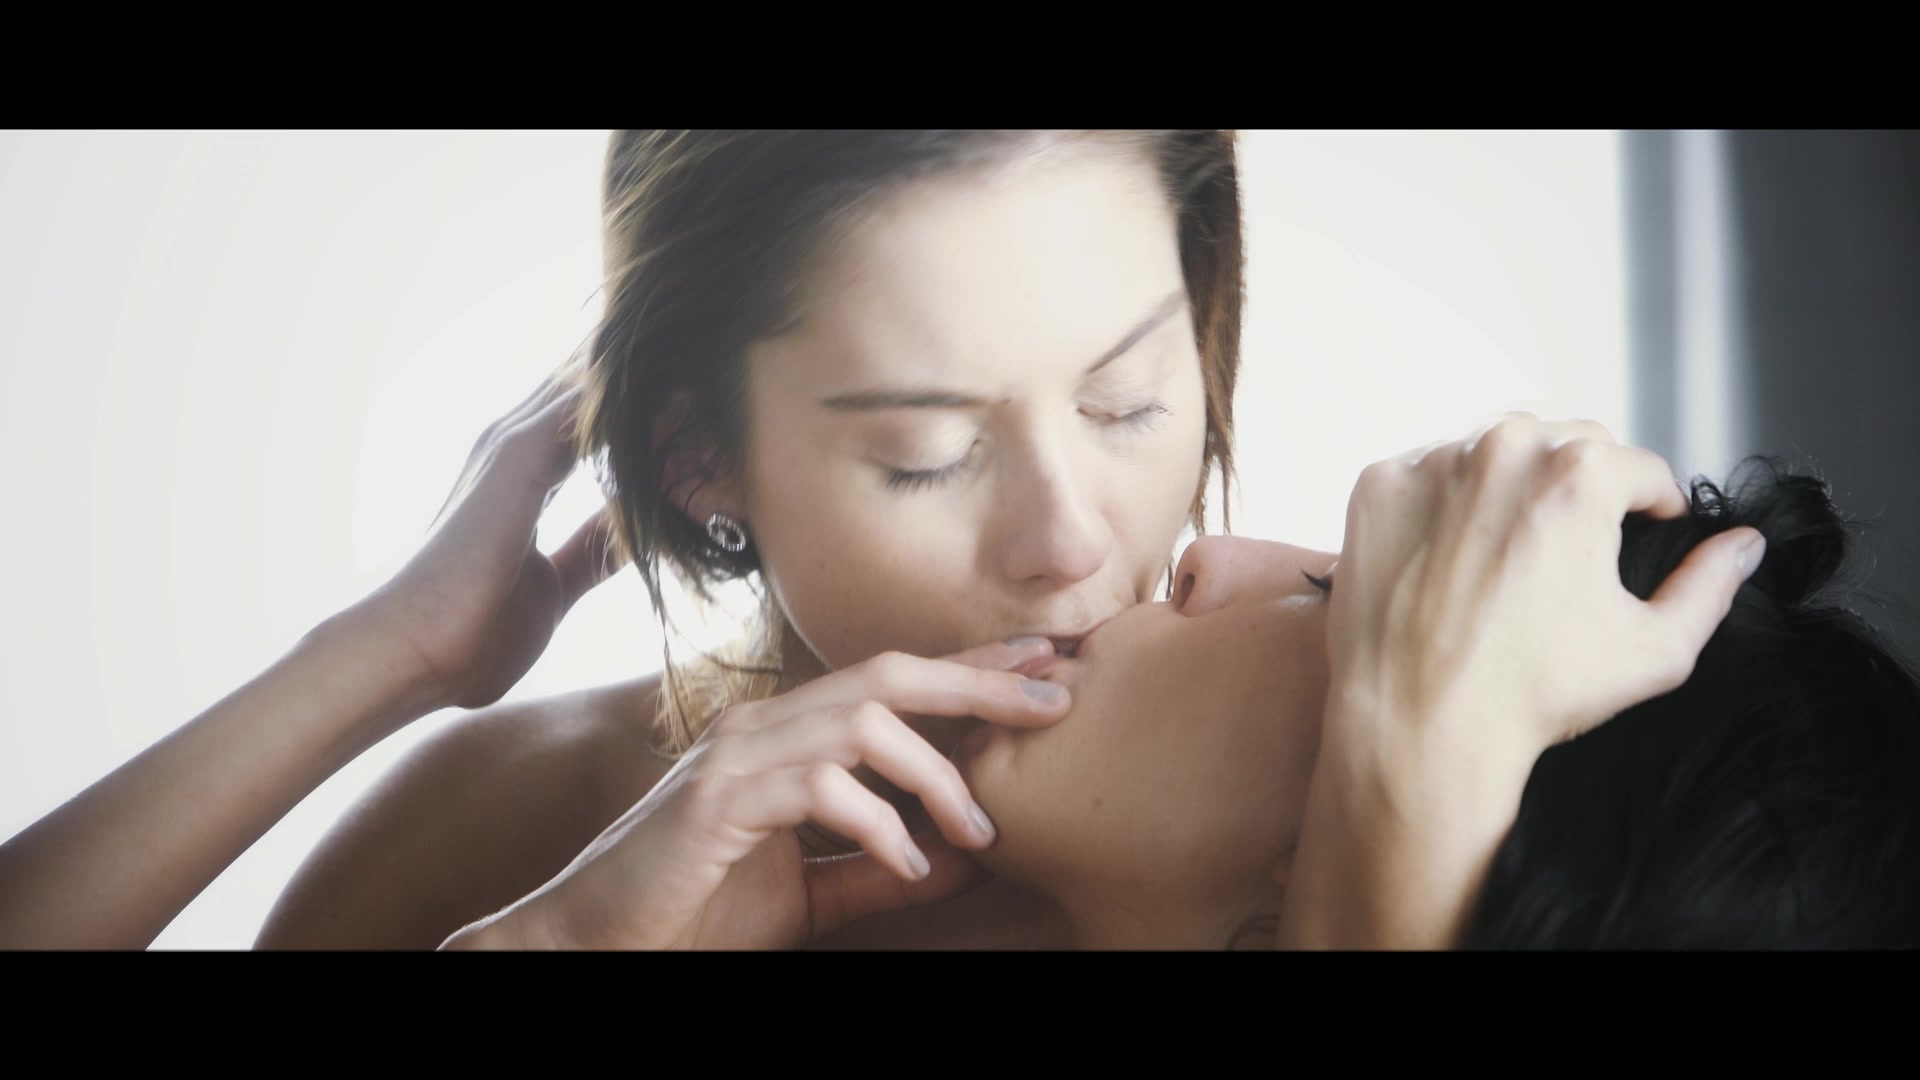 Playboy TV: The Life Erotic, Season 1, Ep. 8 54